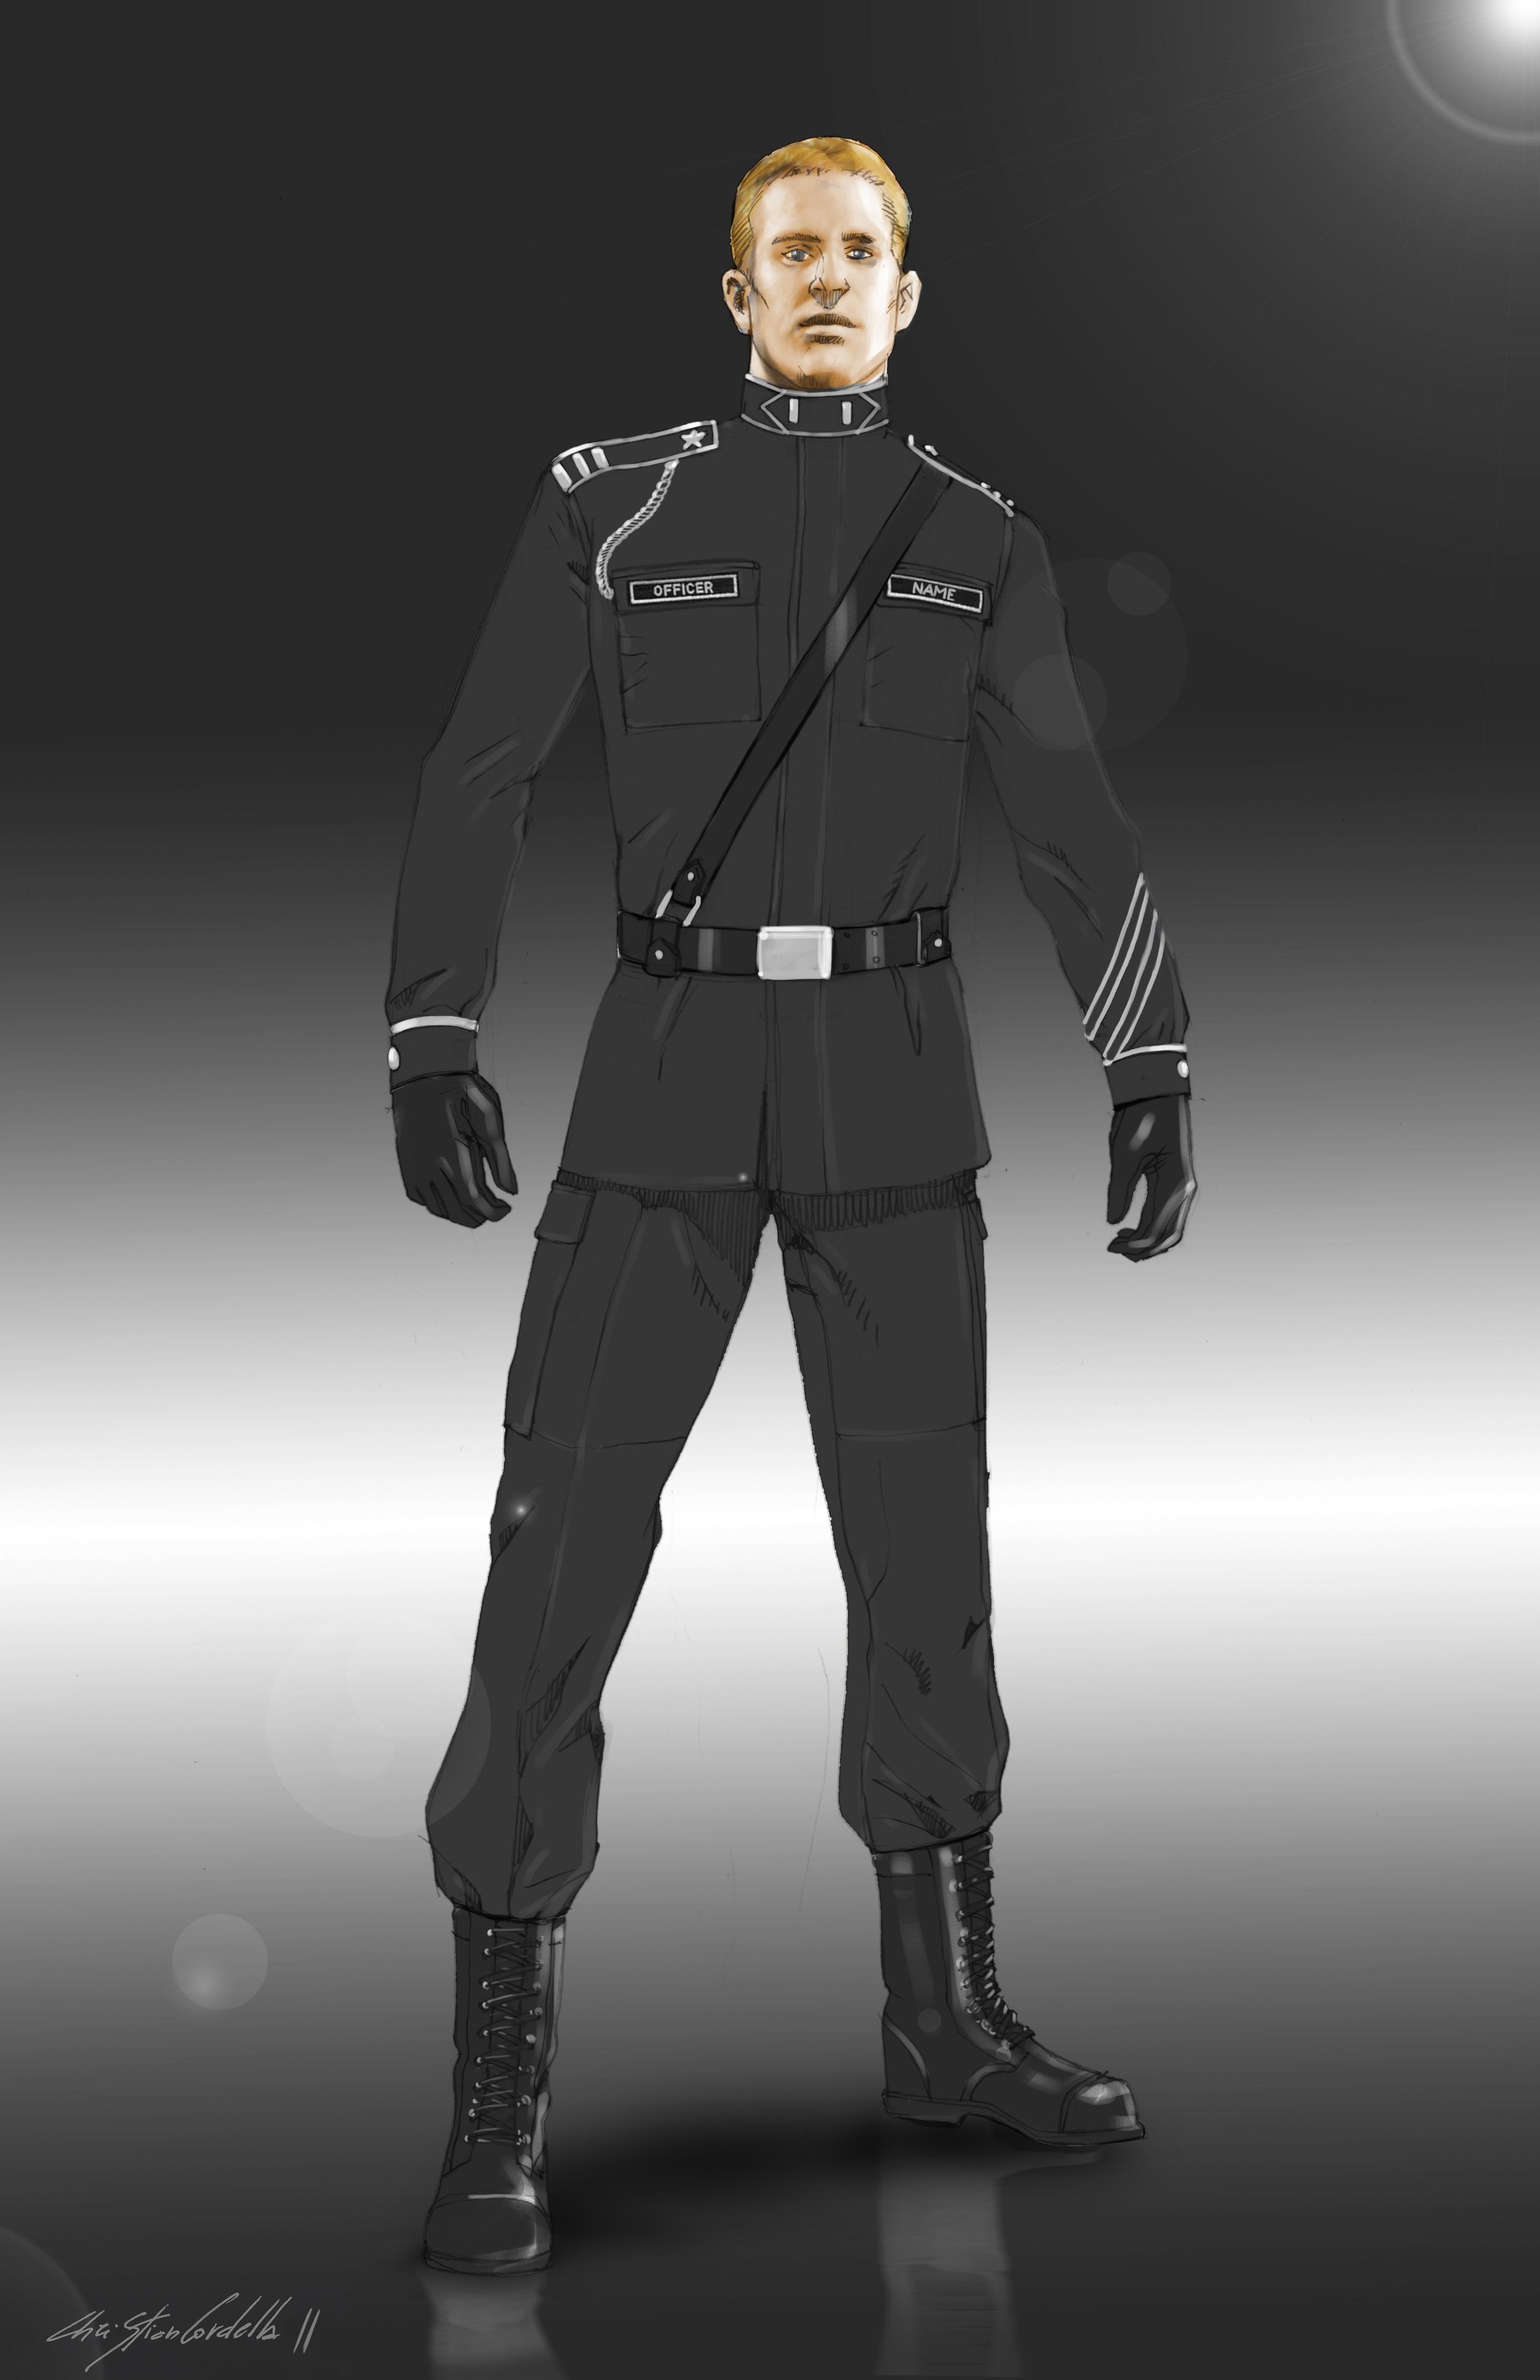 HALO-SOLDIER-FIELD.jpg